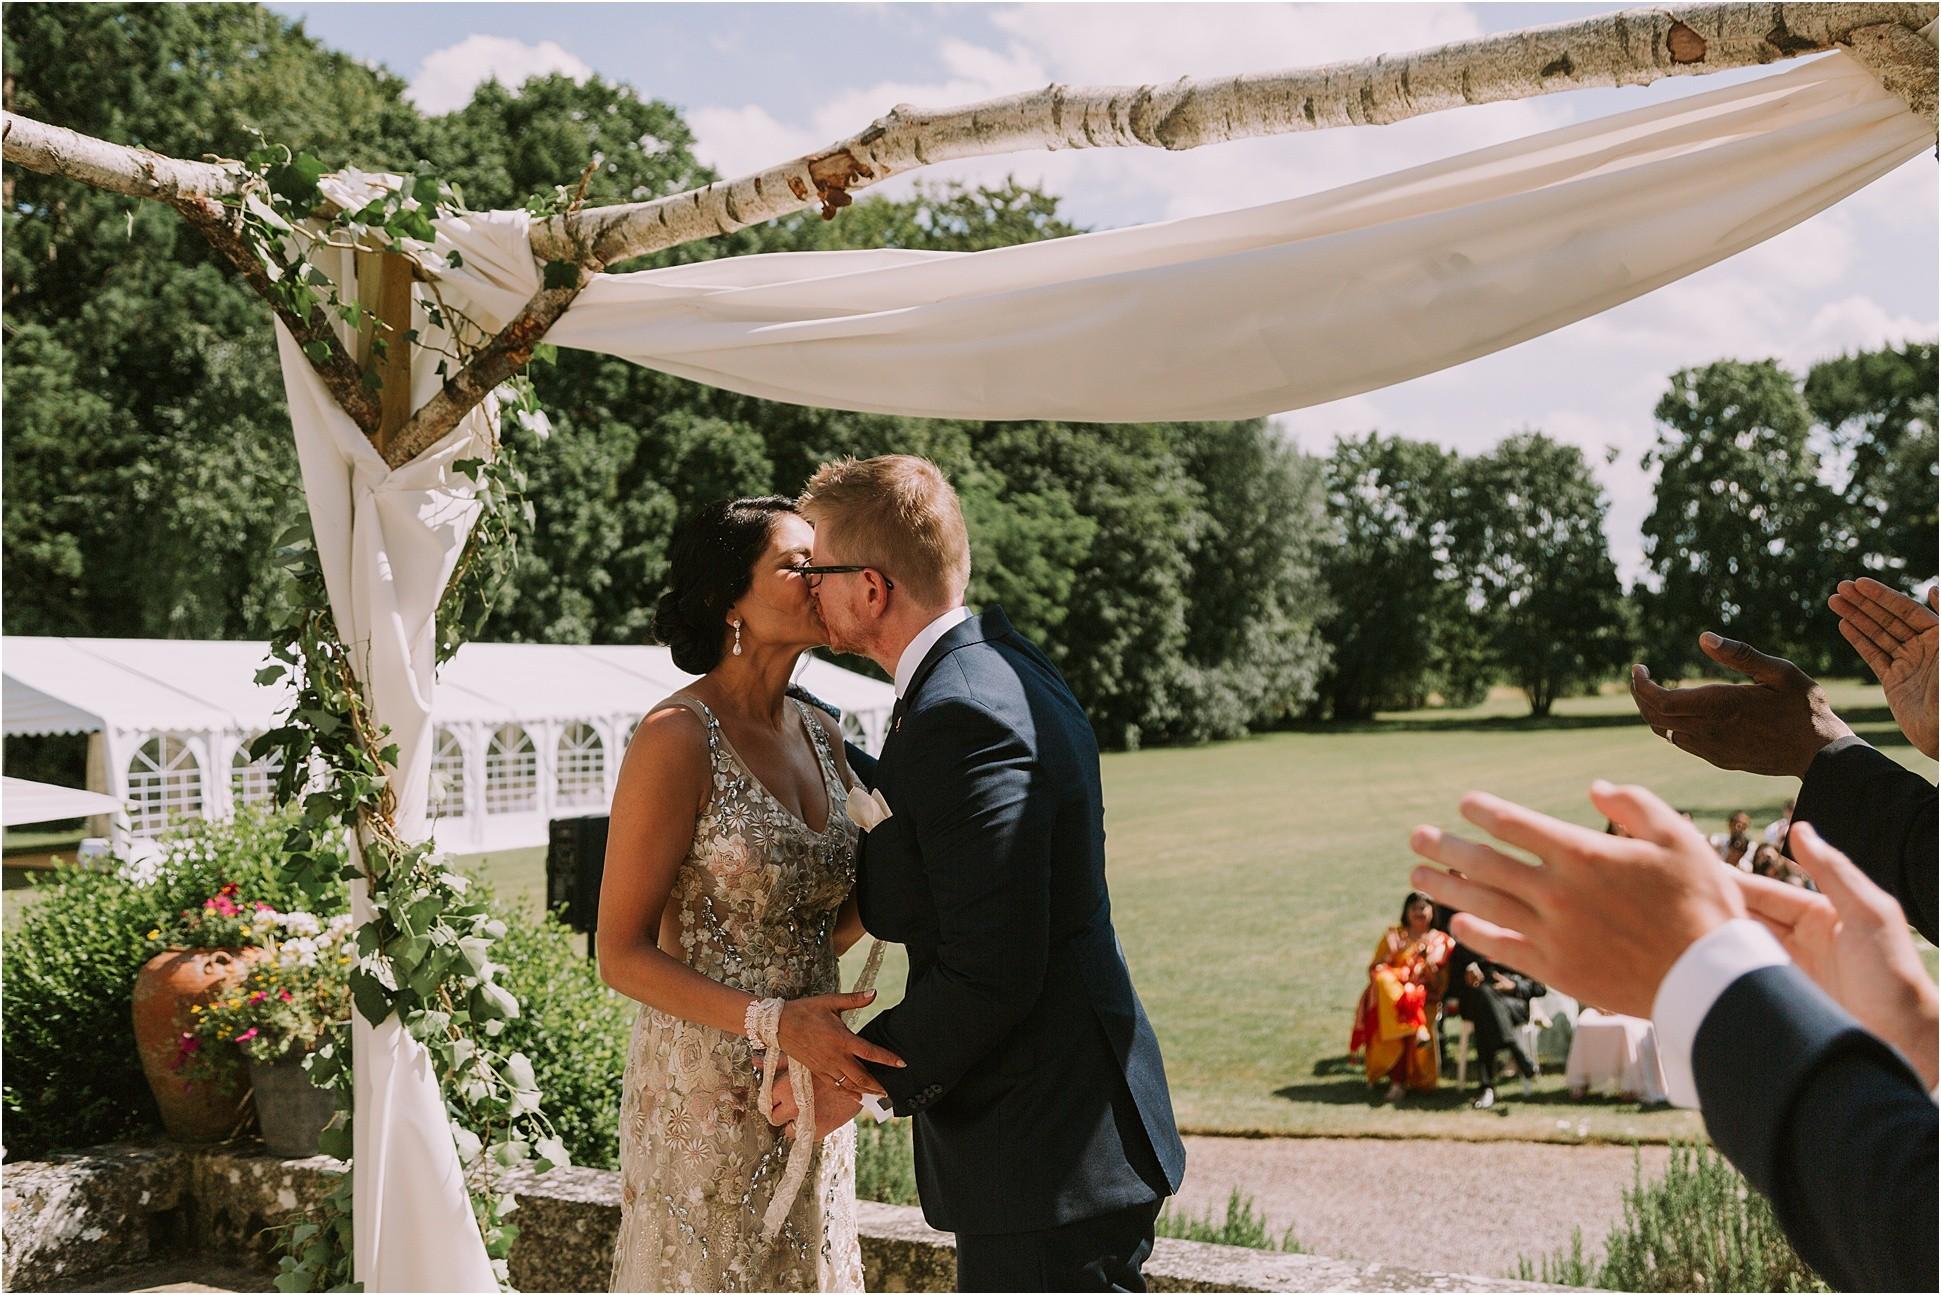 Kateryna-photos-photographe-mariage-chateau-st-paterne-mayenne-normandie_0118.jpg